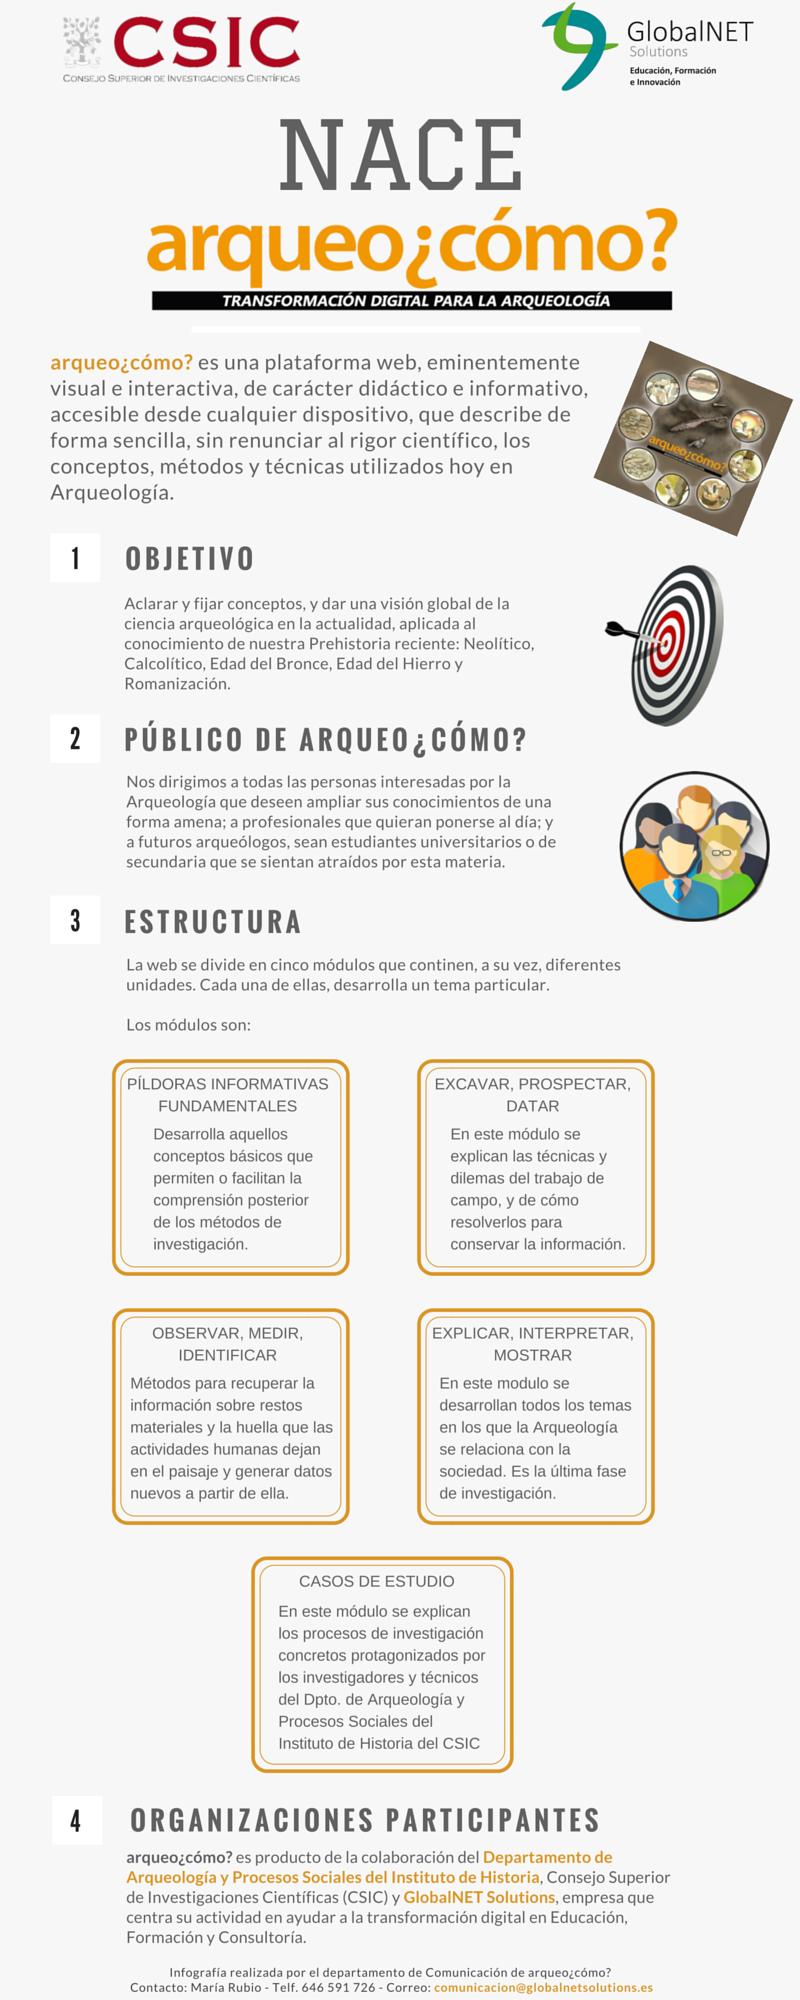 Infografía  - Nace arqueocómo